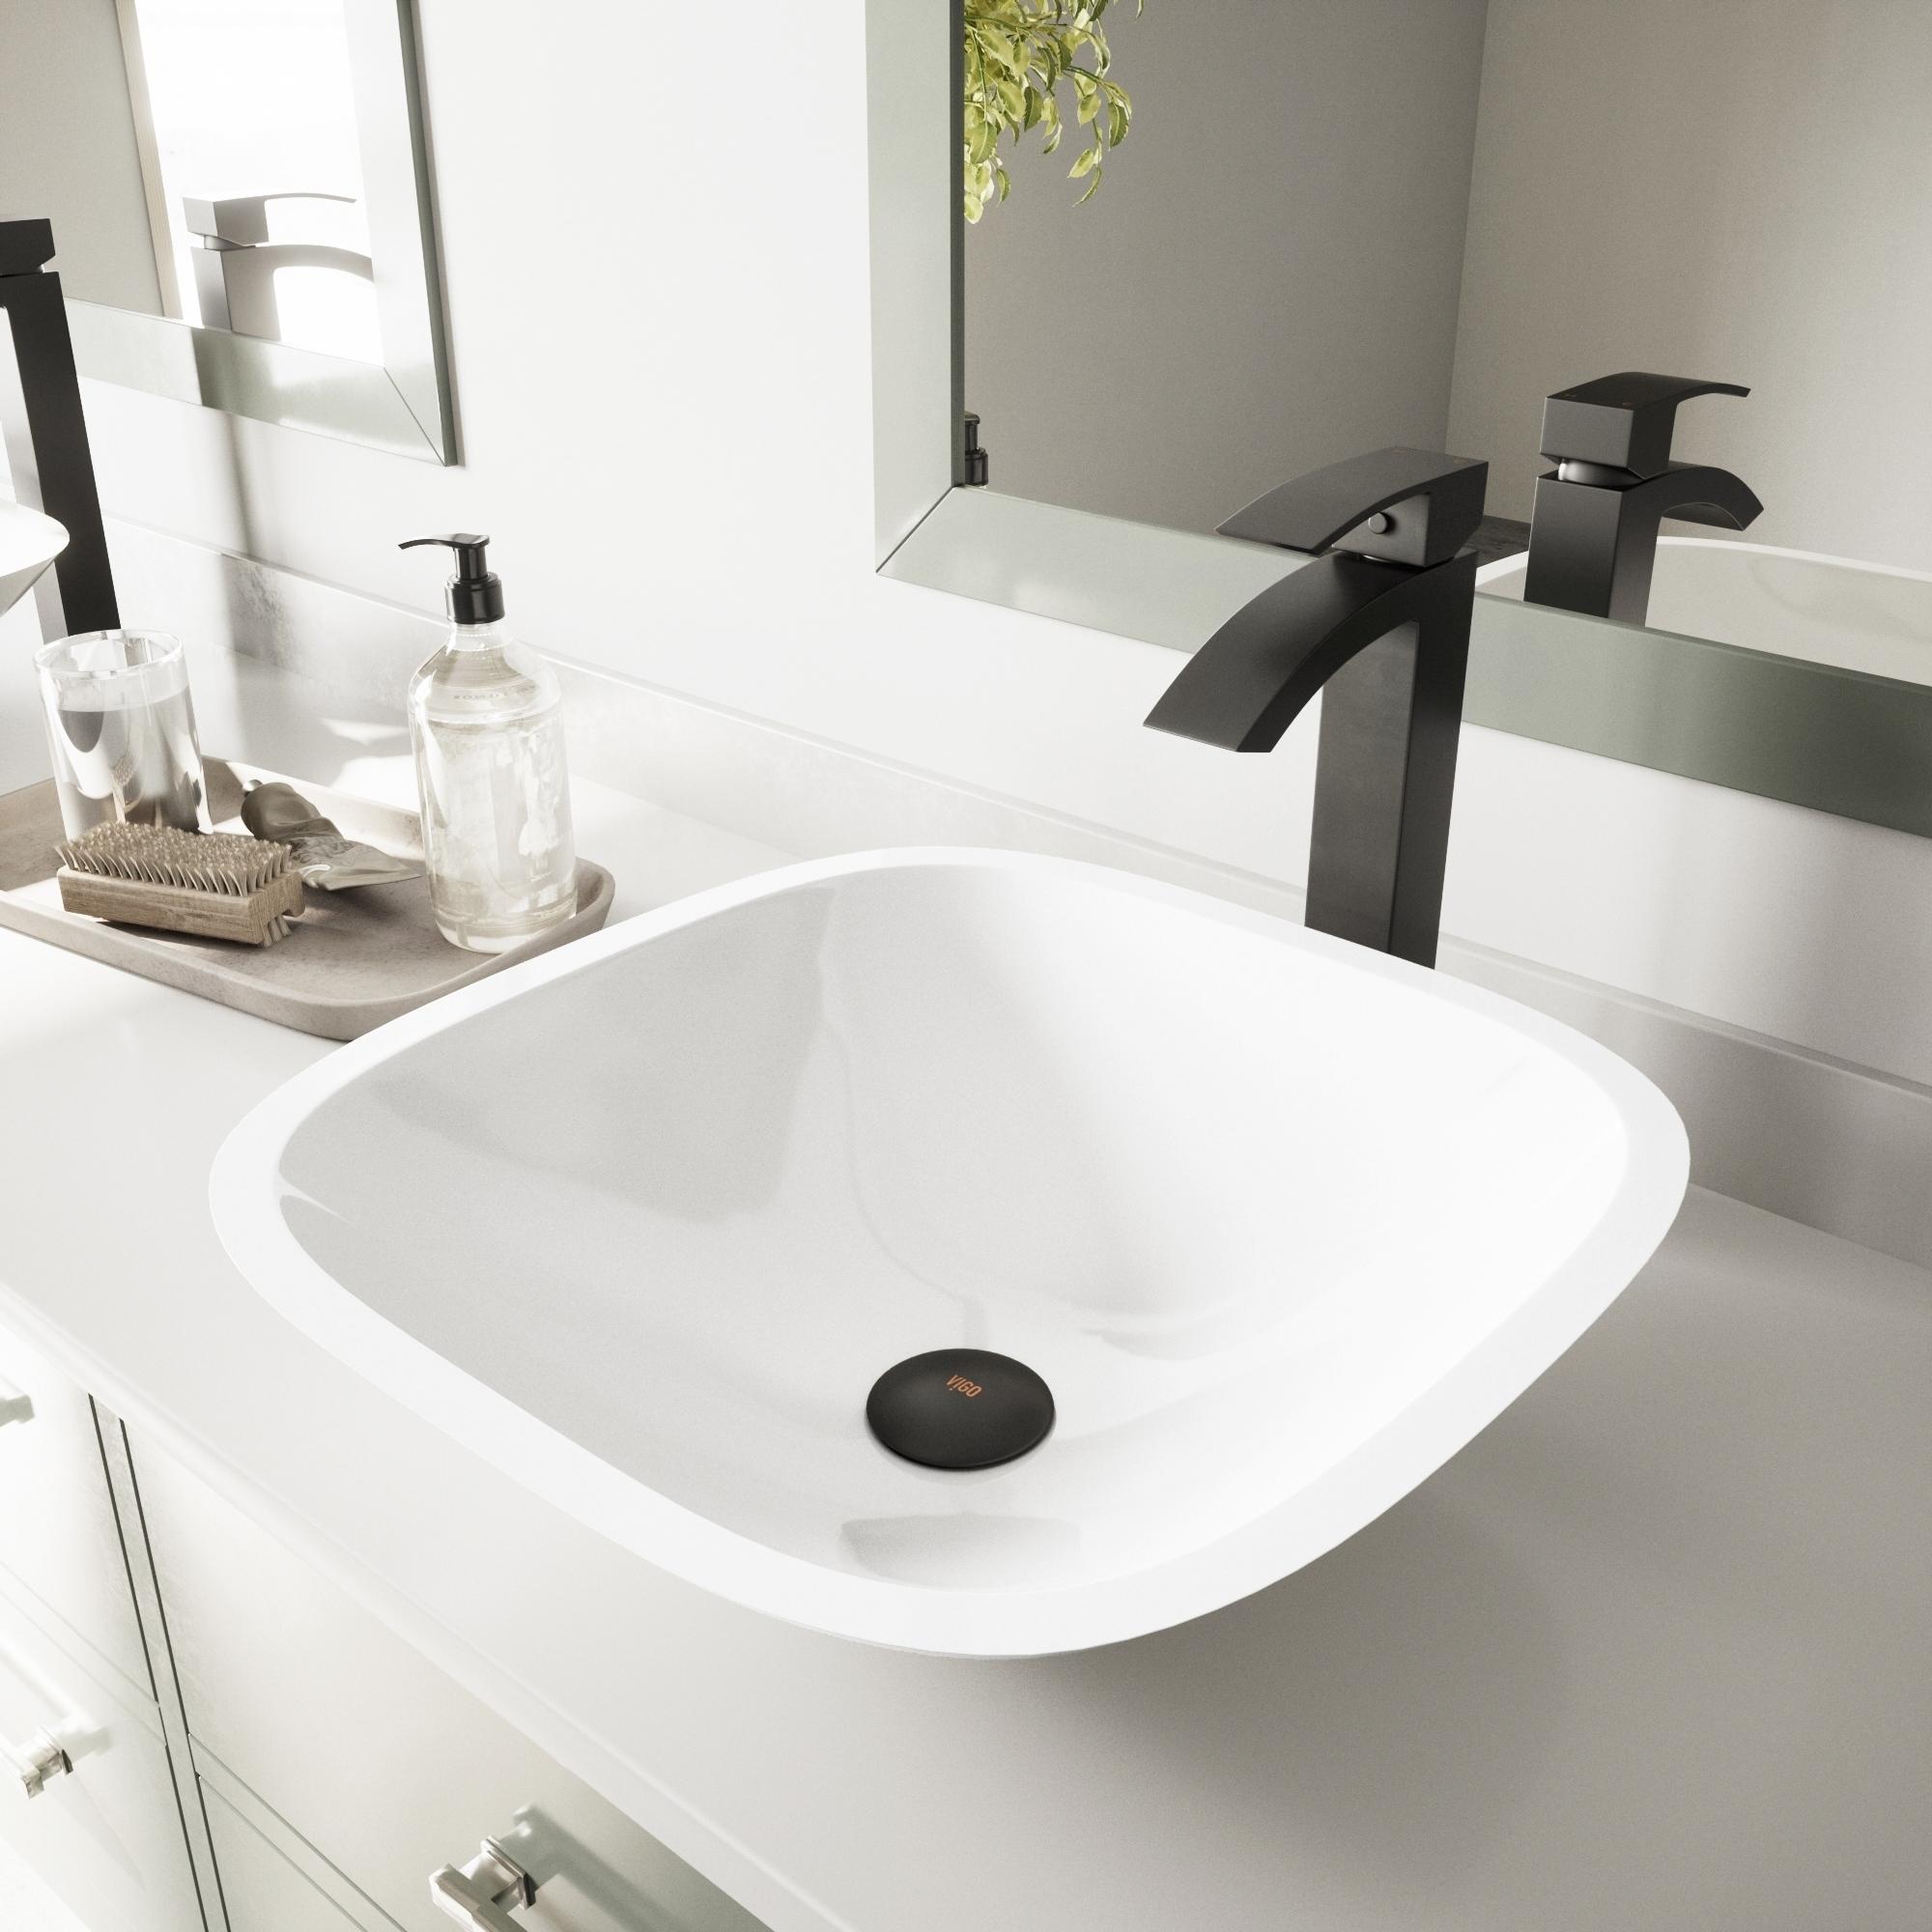 Vigo Square Shaped White Phoenix Stone Vessel Bathroom Si...